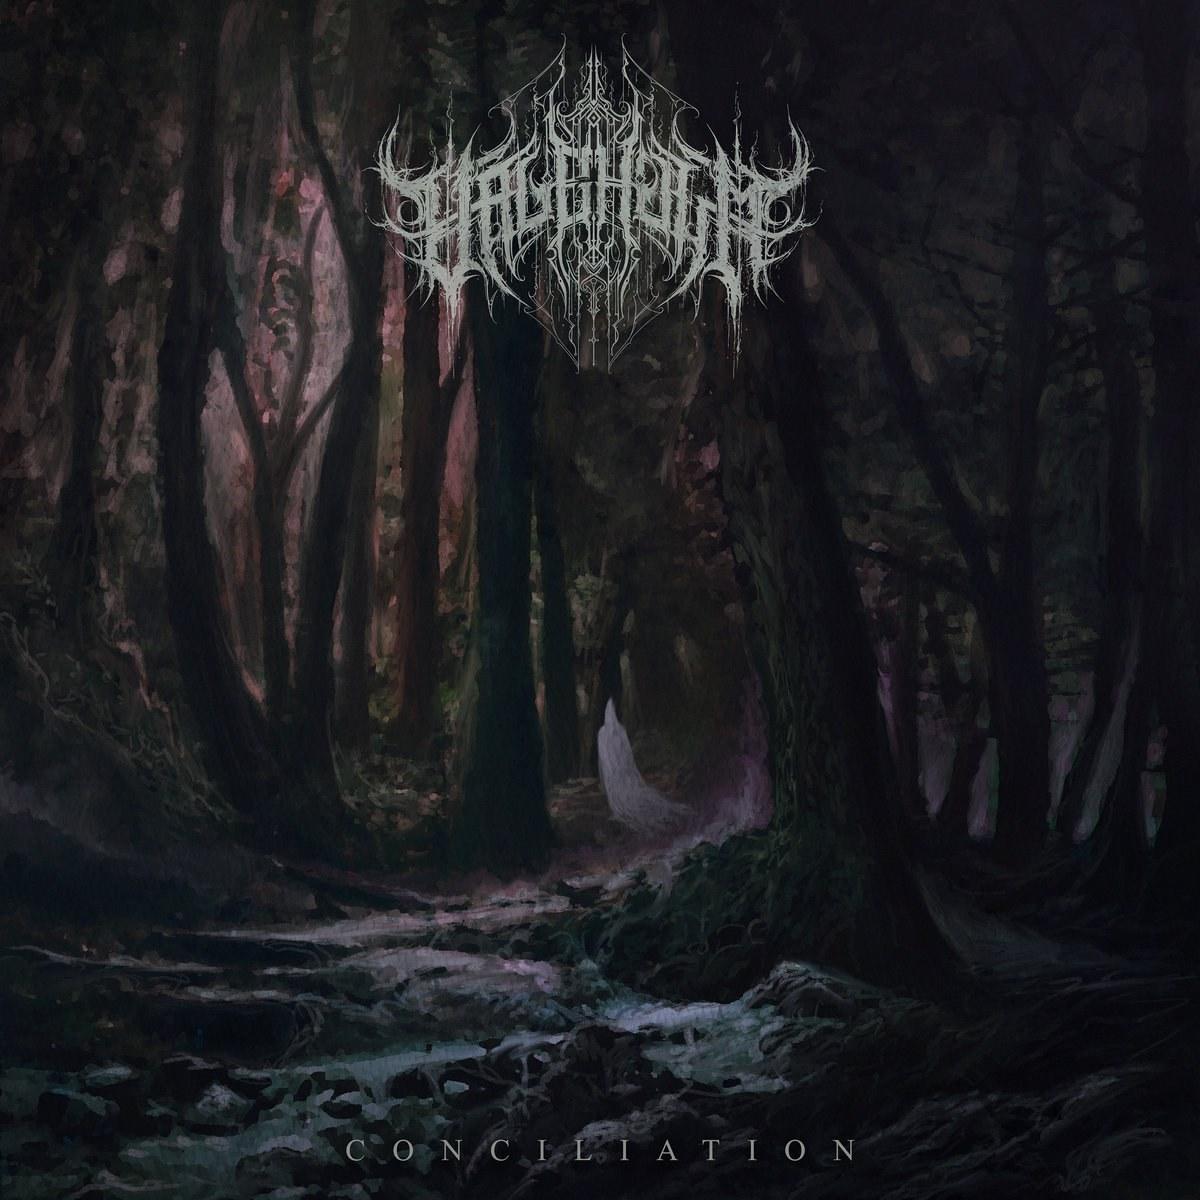 Valeholm - Conciliation